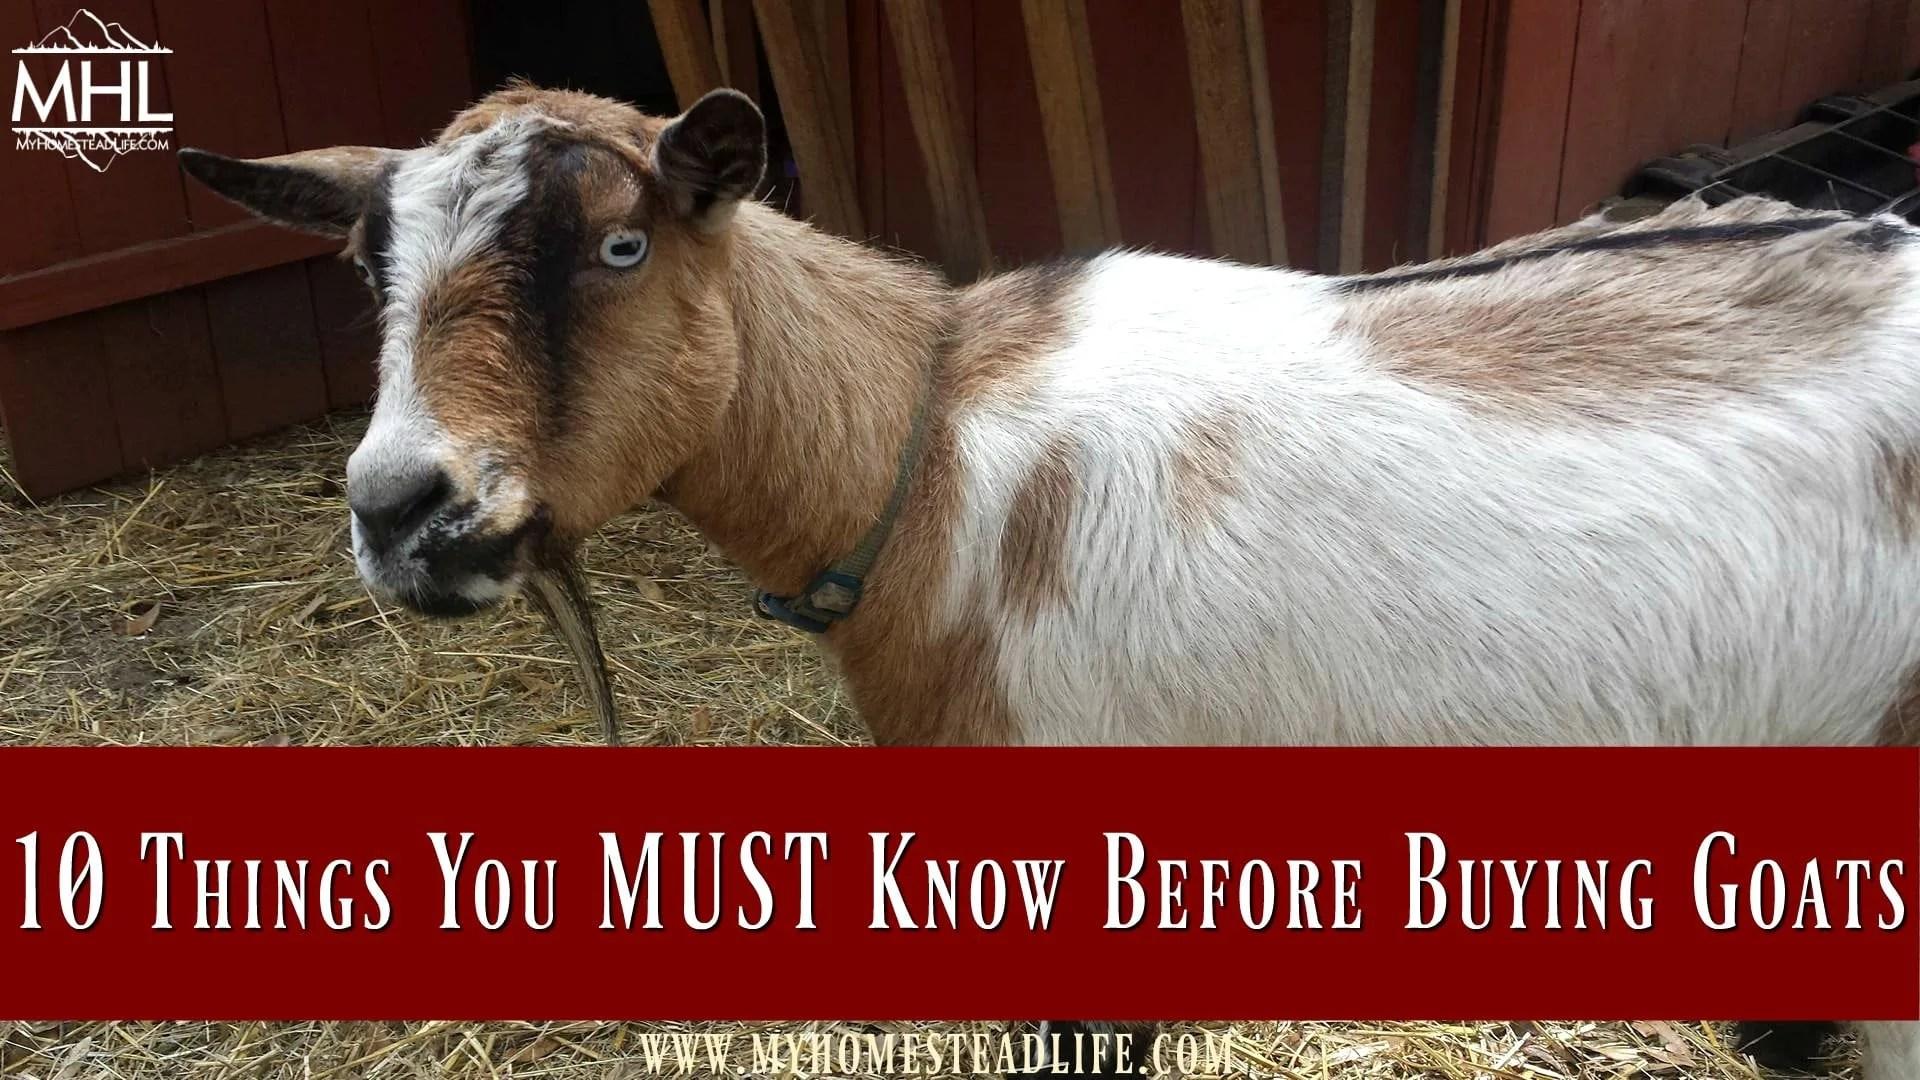 Ivomec for pygmy goats